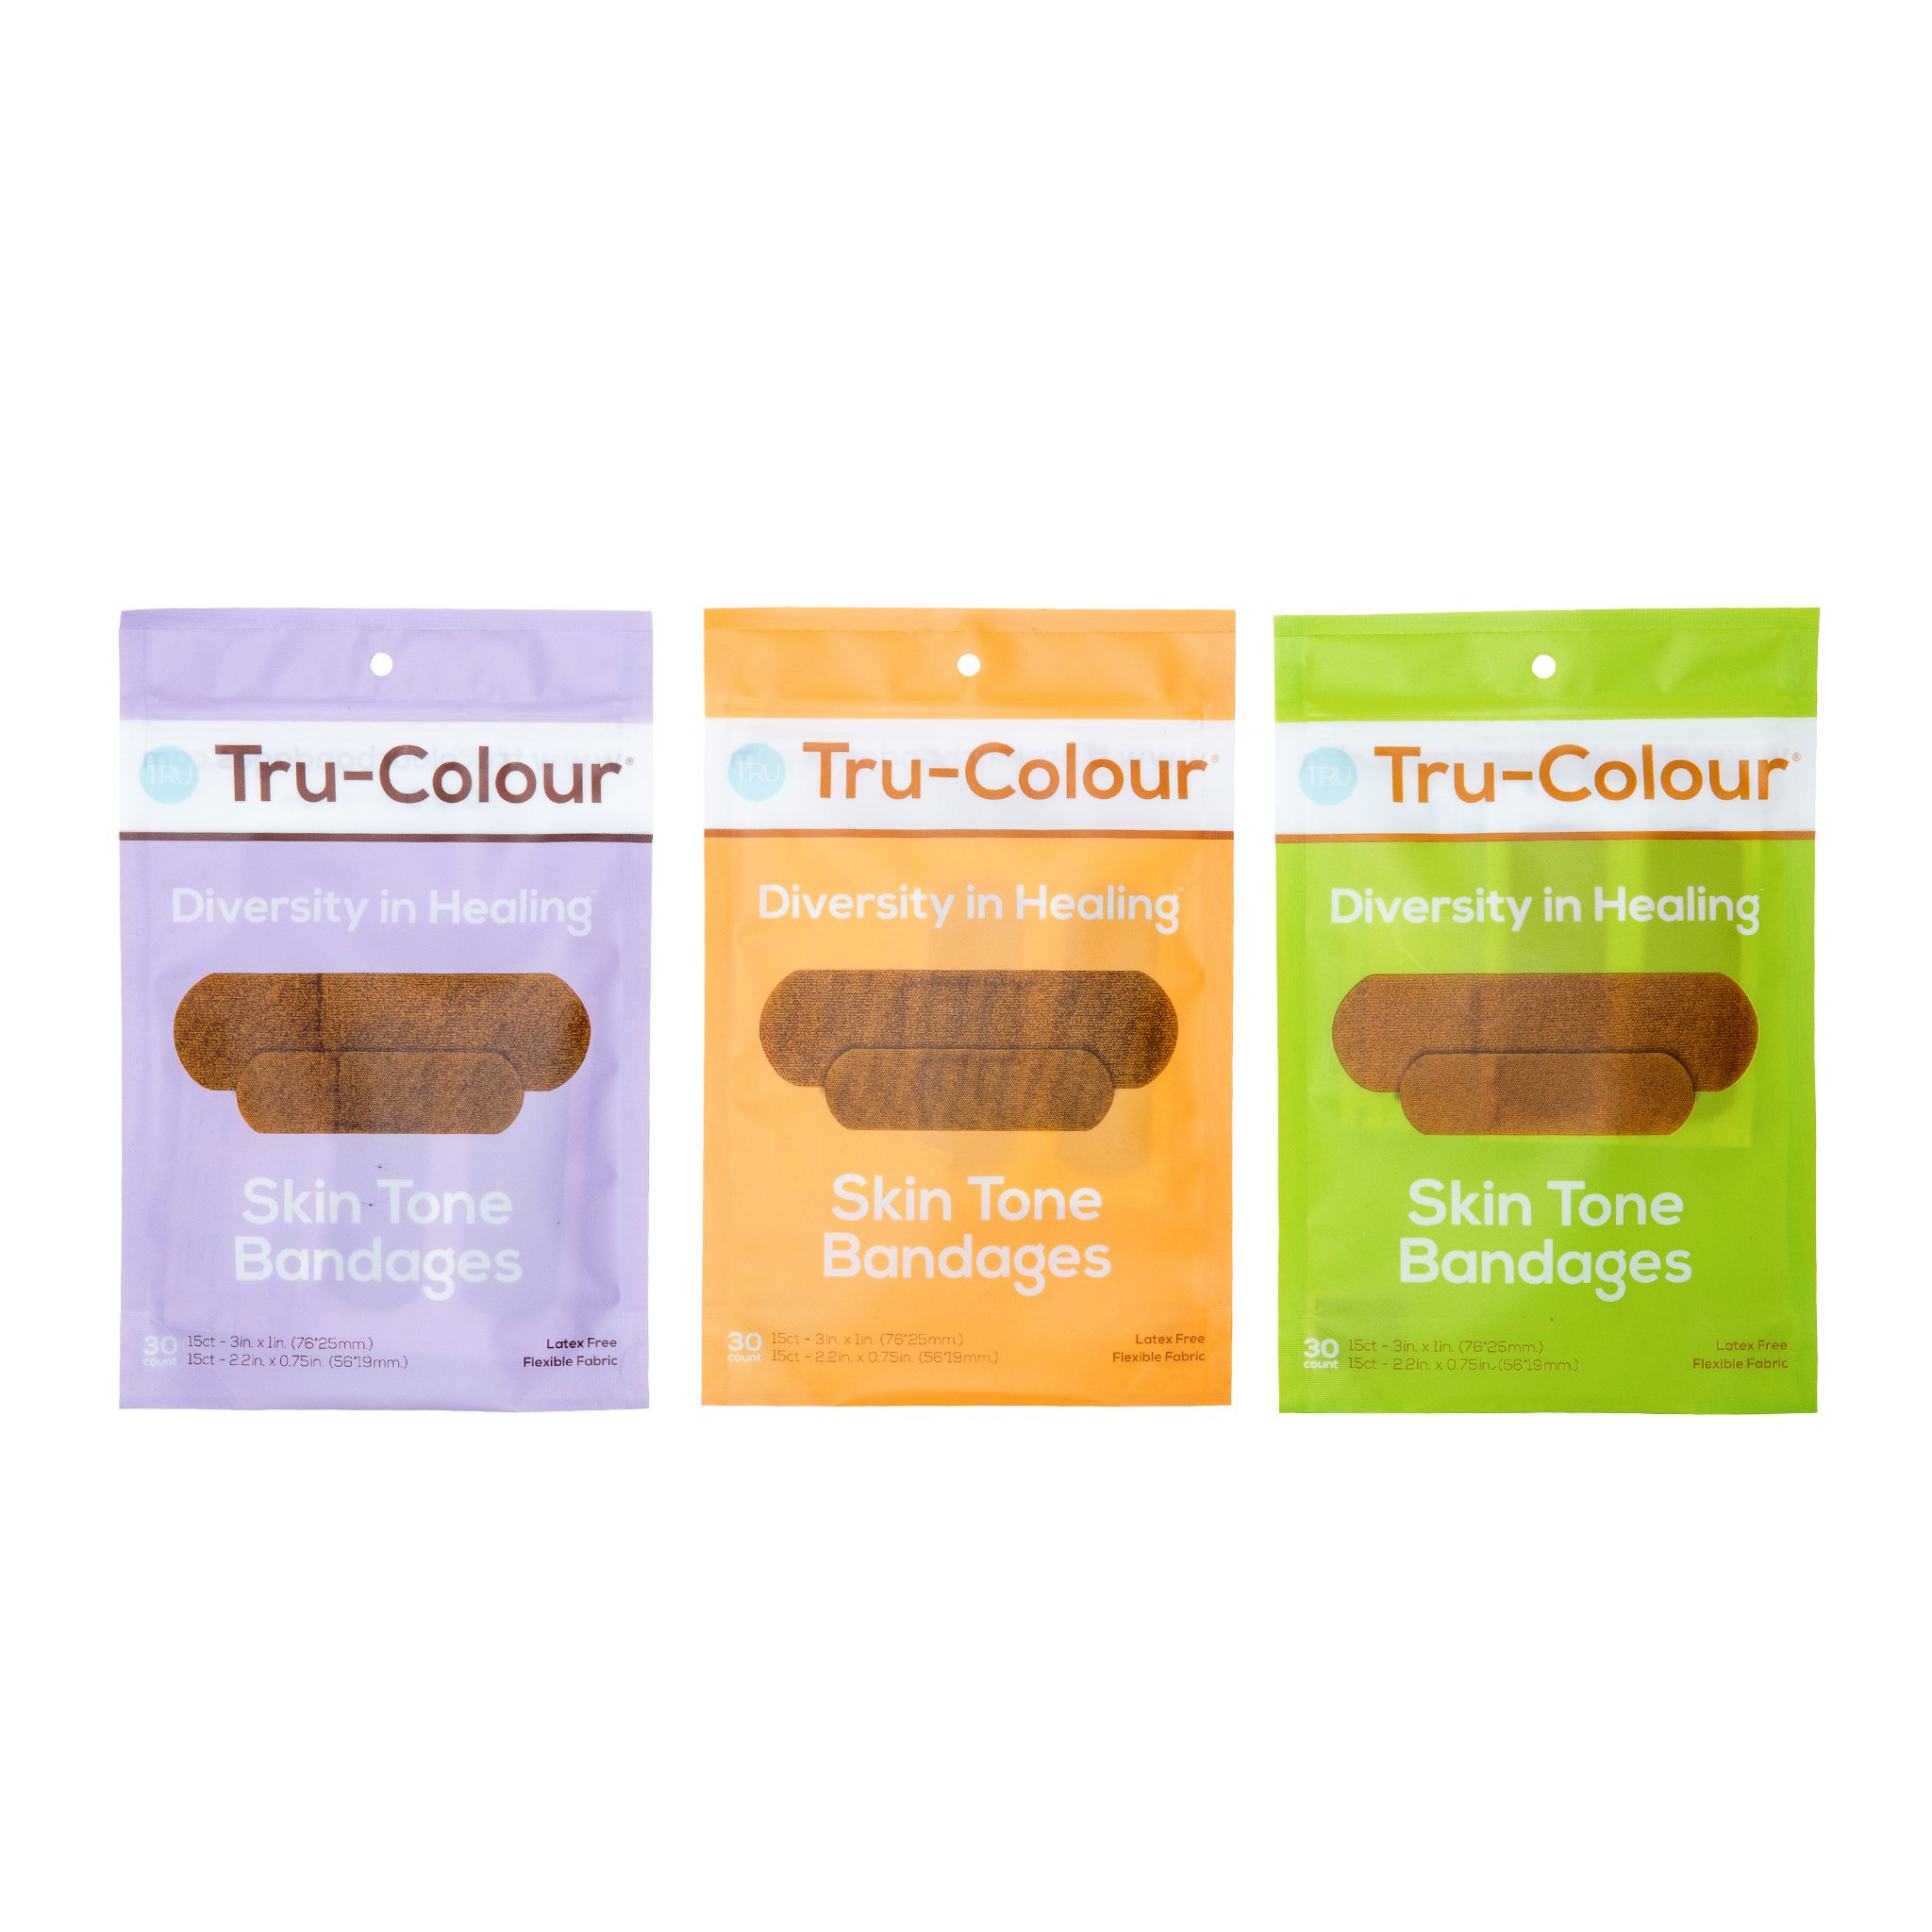 Tru-Colour Bandages Skin Tone Flexible Fabric Bandages Color Combo Pack - 3 Pack (90 Count)